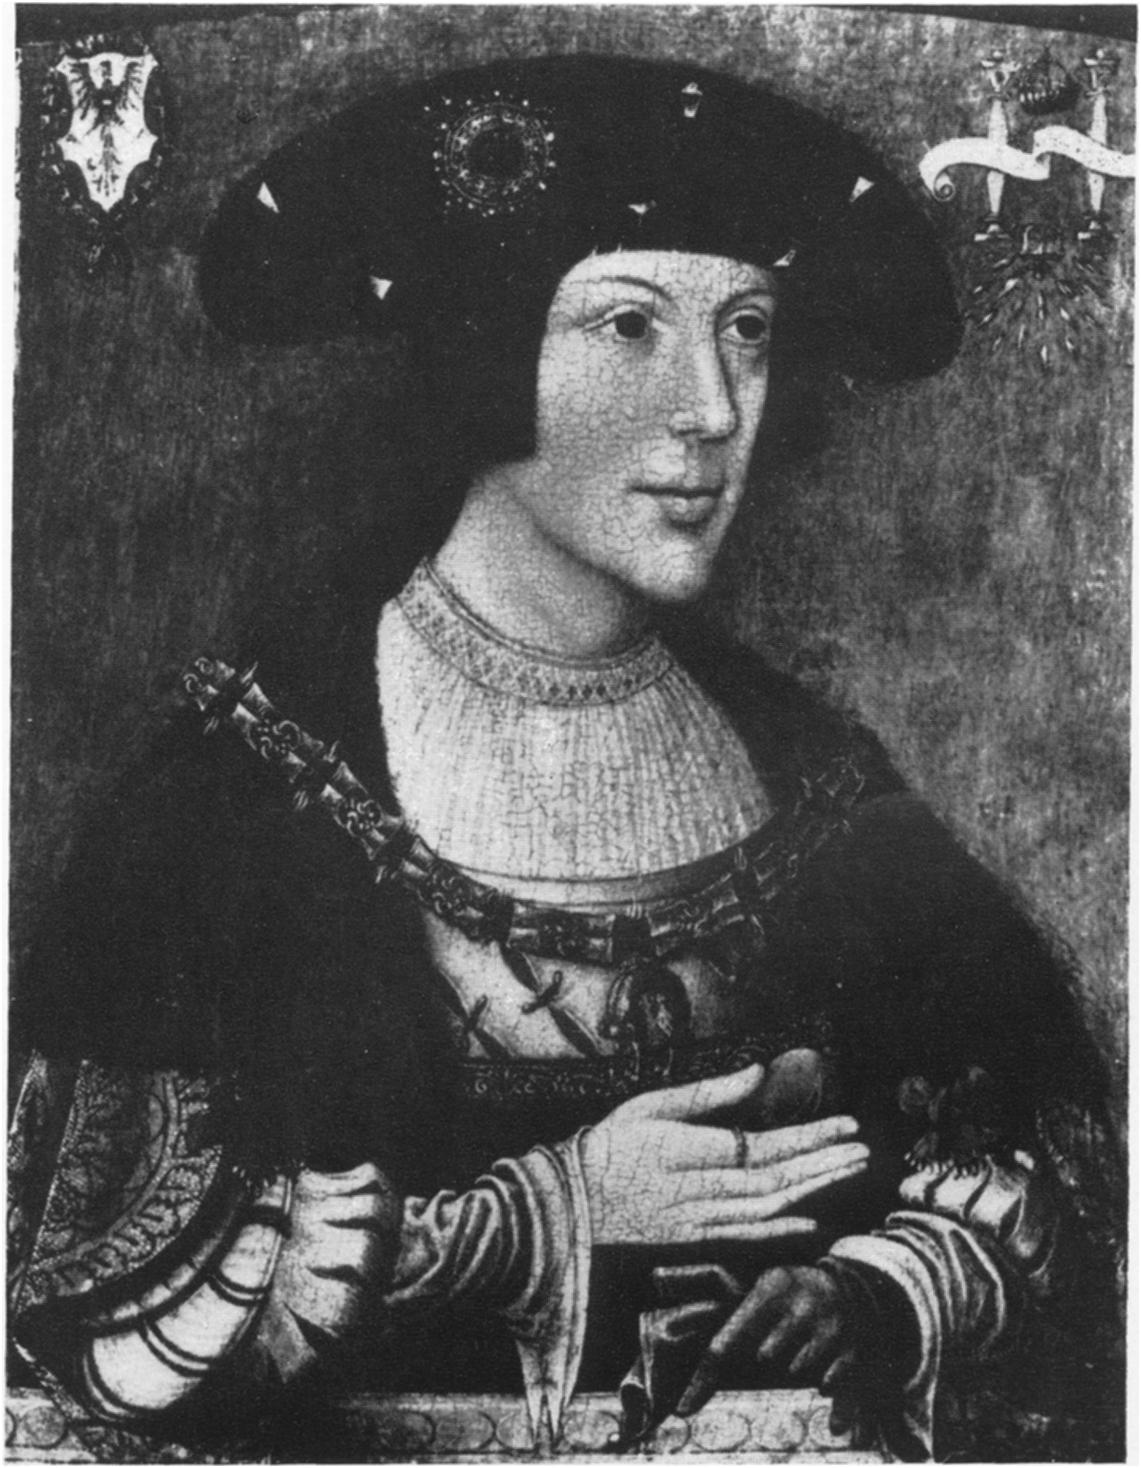 https://upload.wikimedia.org/wikipedia/commons/d/d9/Portrait_of_Charles_V_Holy_Roman_Emperor._Anonymous_1520-21.jpg